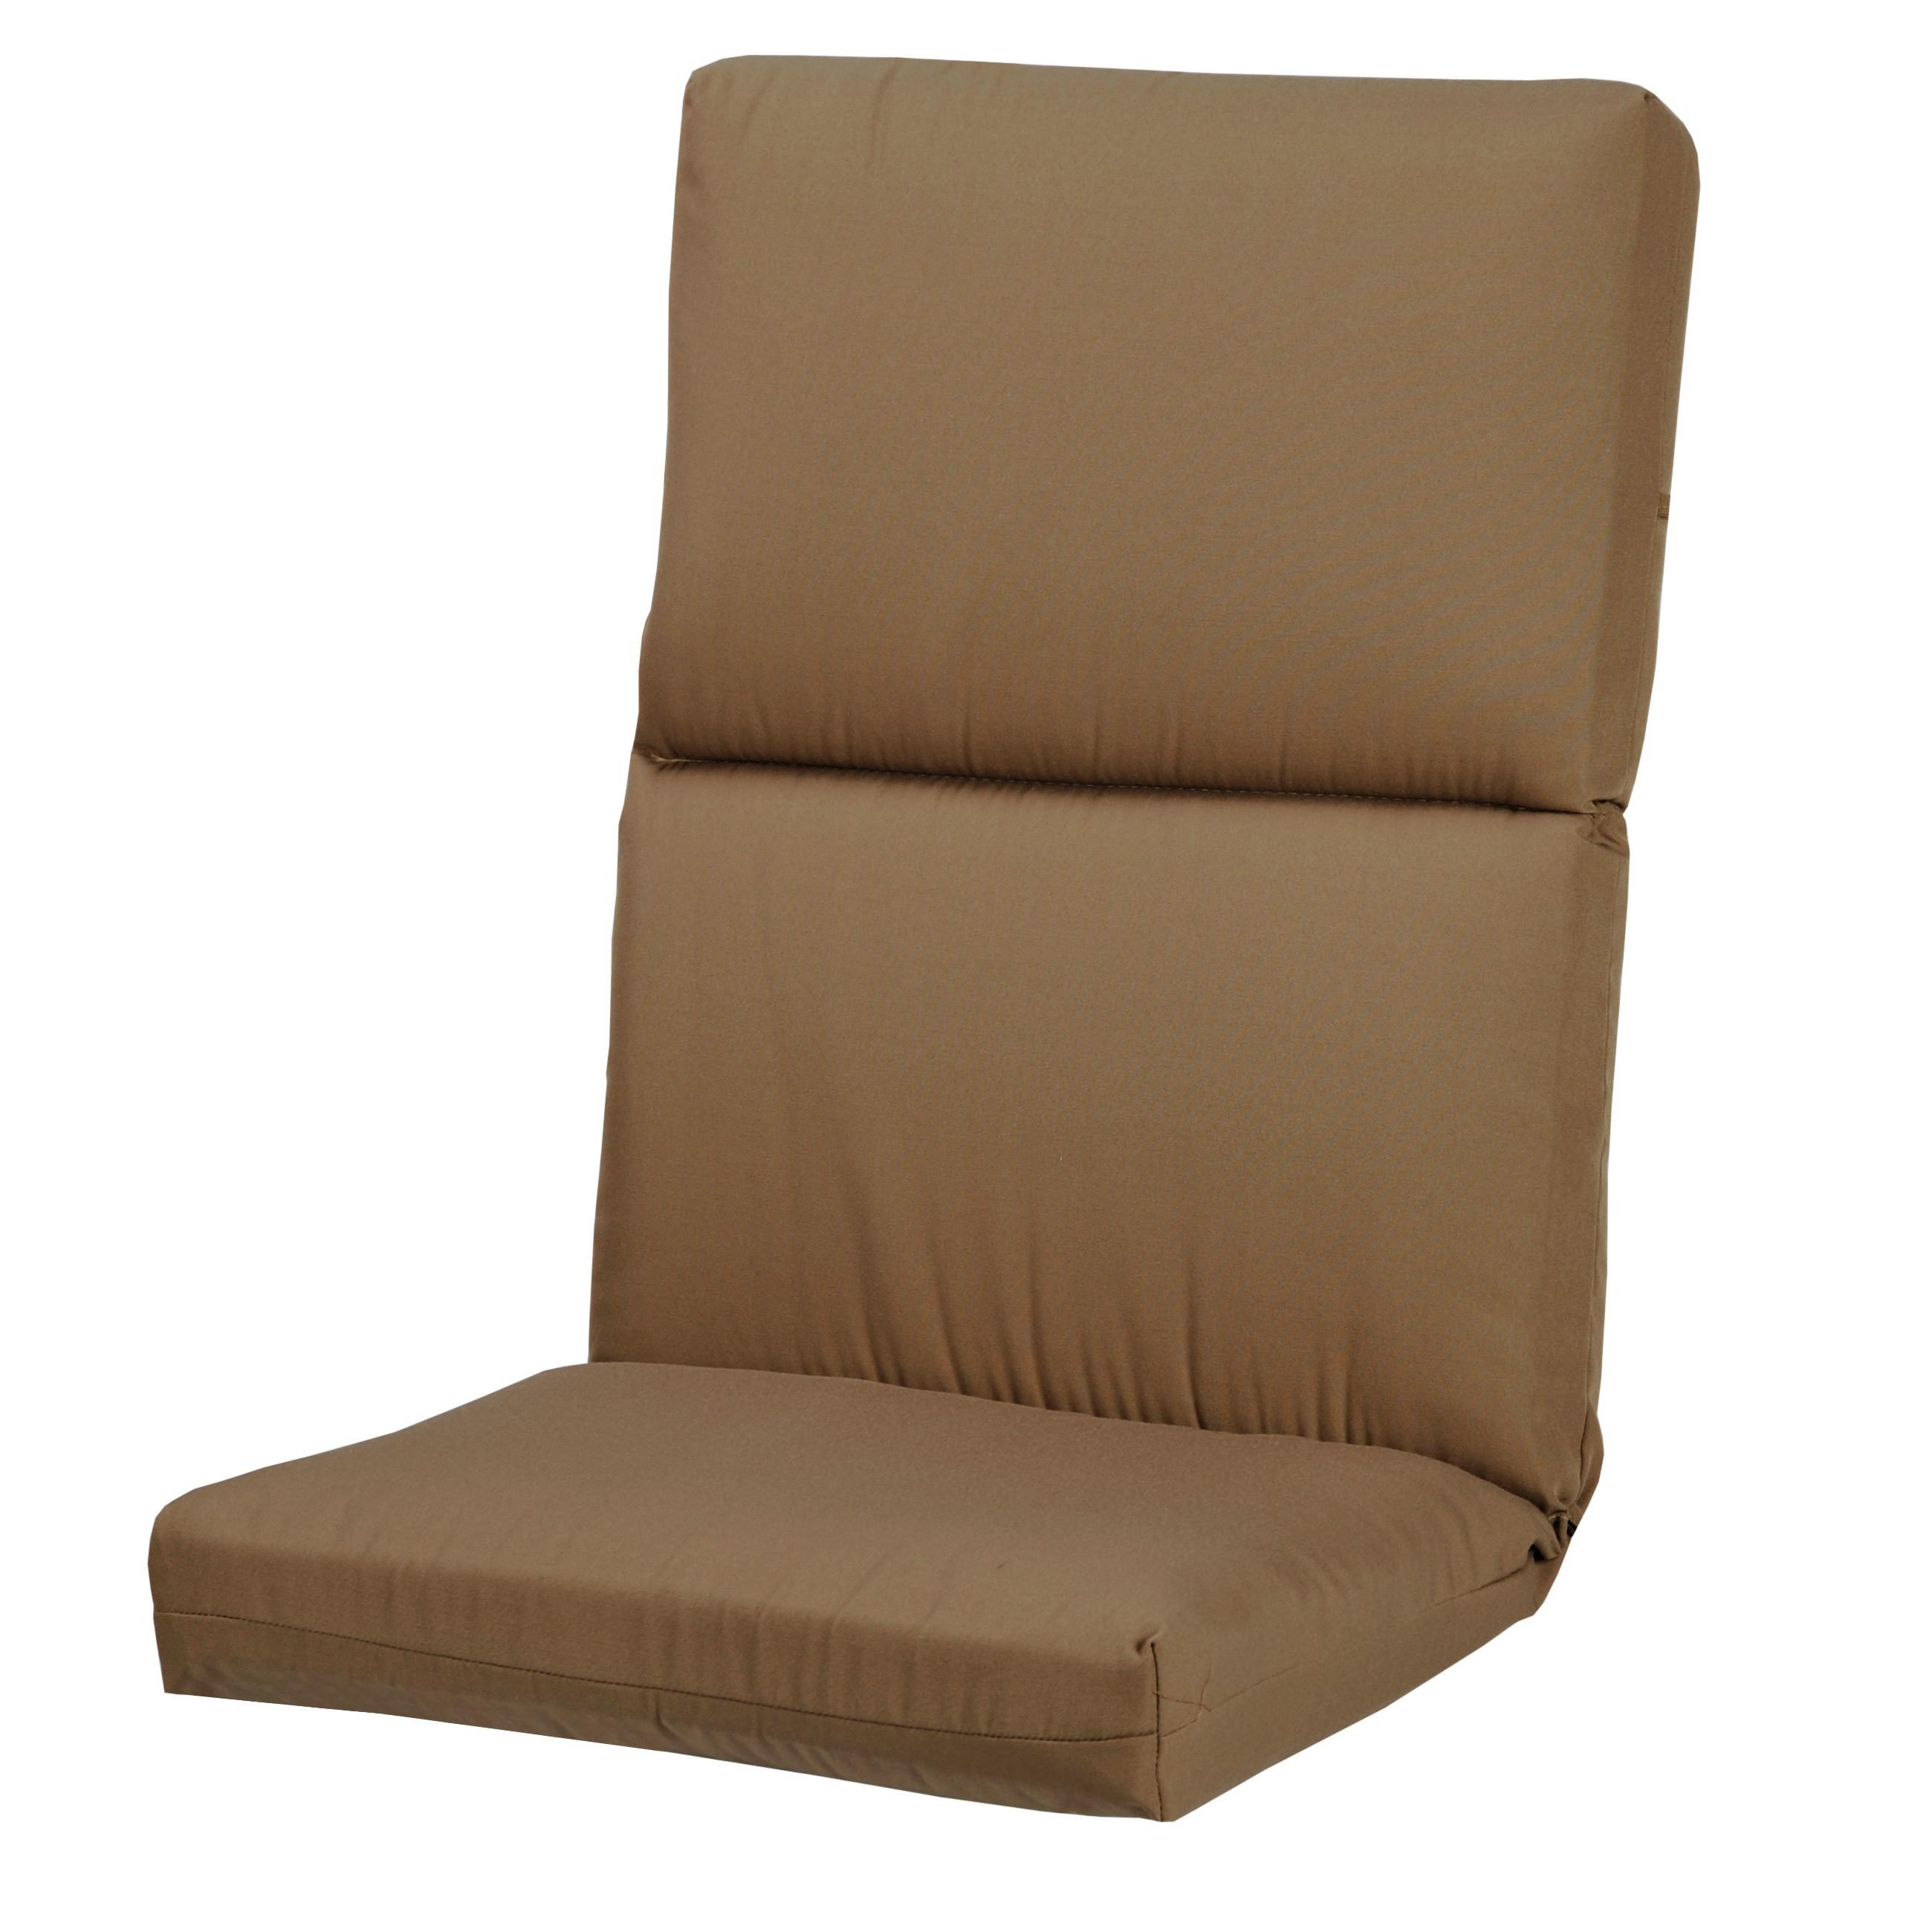 highback patio chair